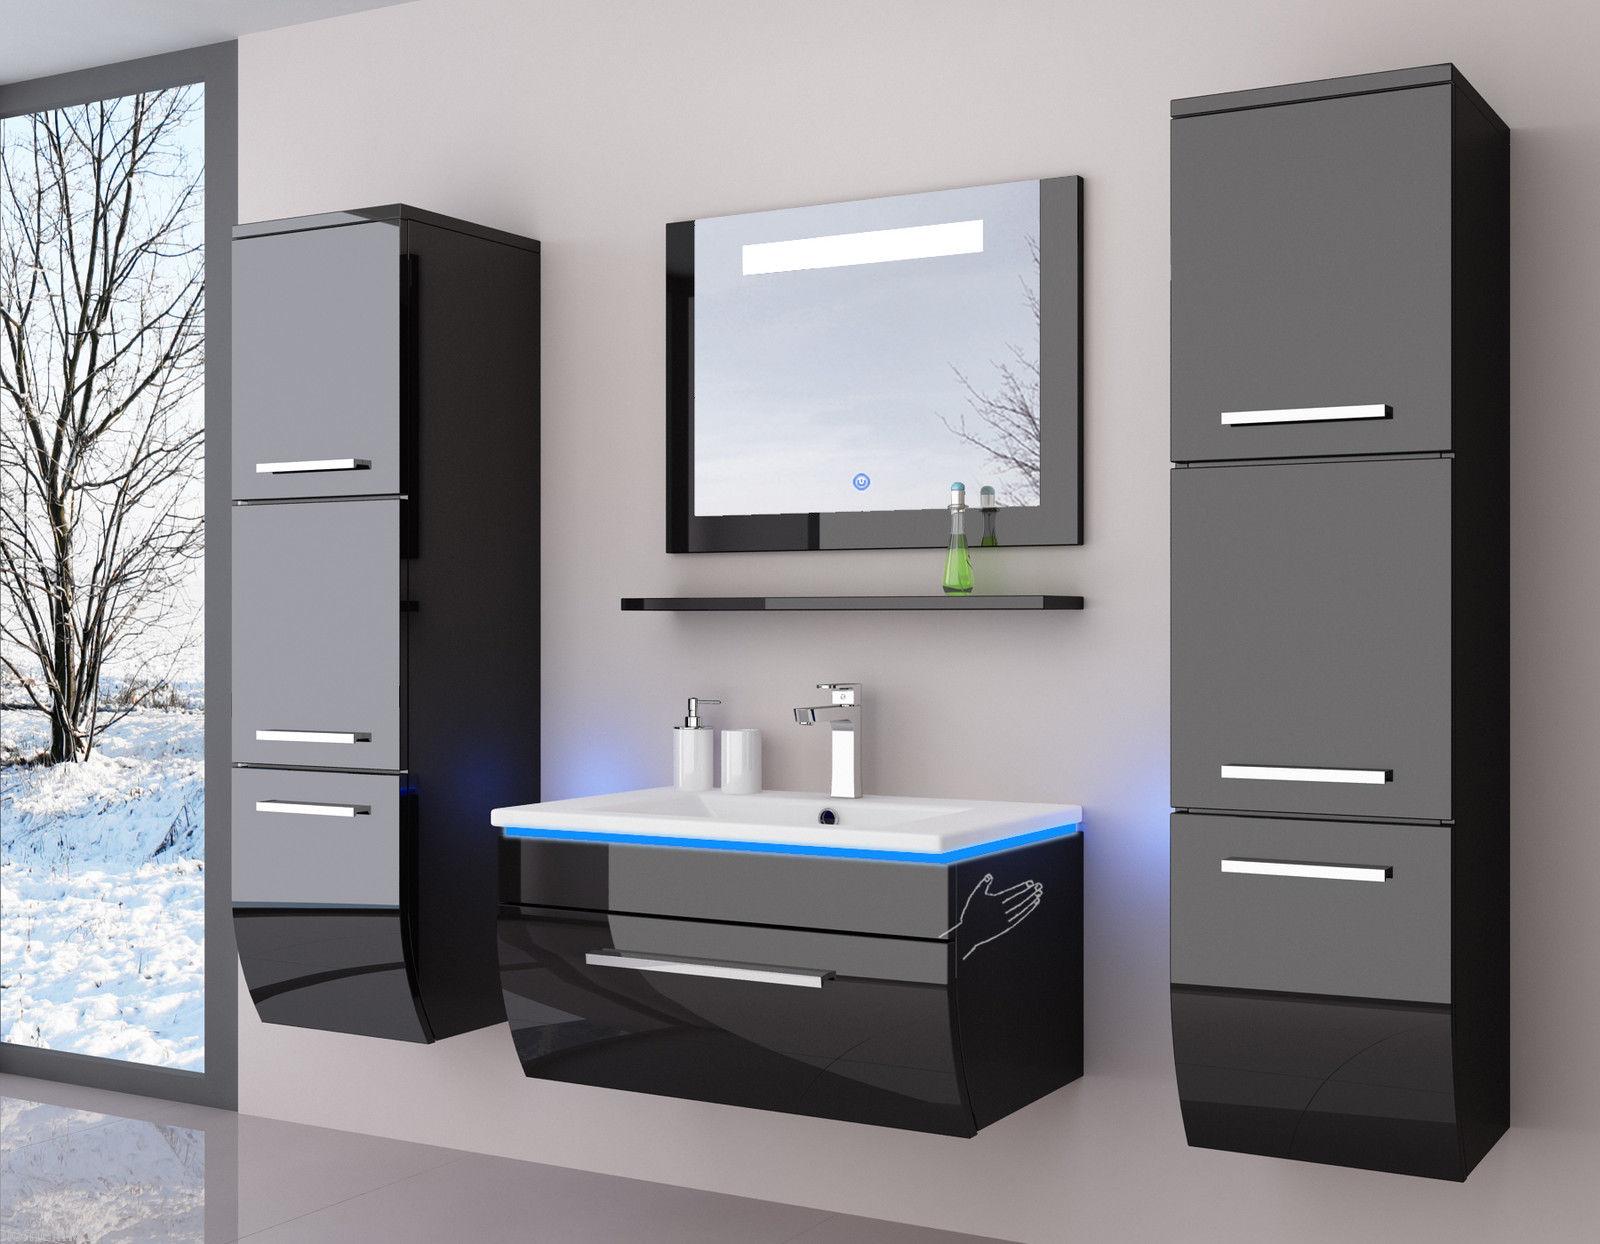 Badezimmer Möbel Set Aus MDF Holz Lackiert 6-teilig